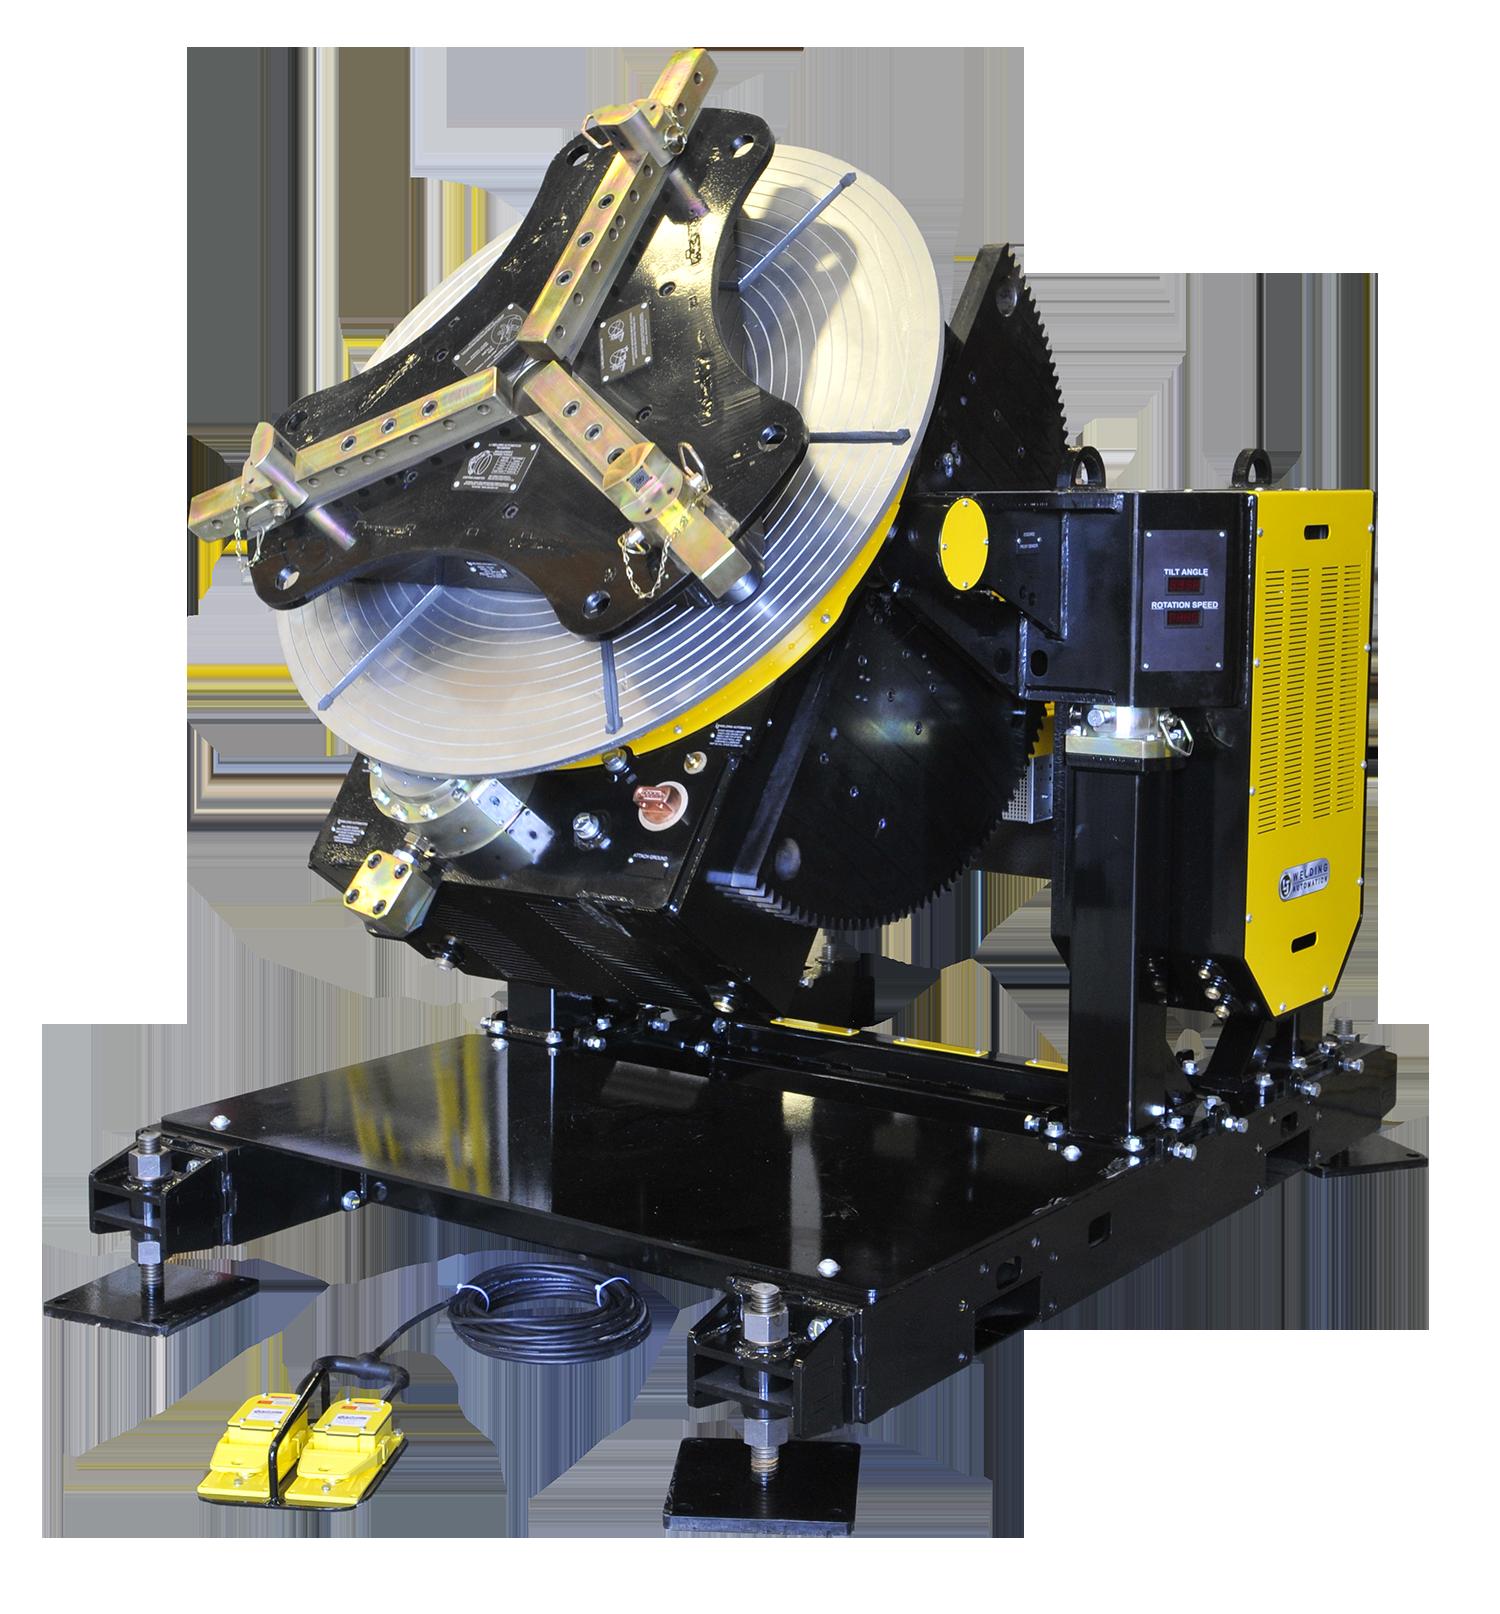 t24ps-100 gear tilt pipe welding positioner for sale